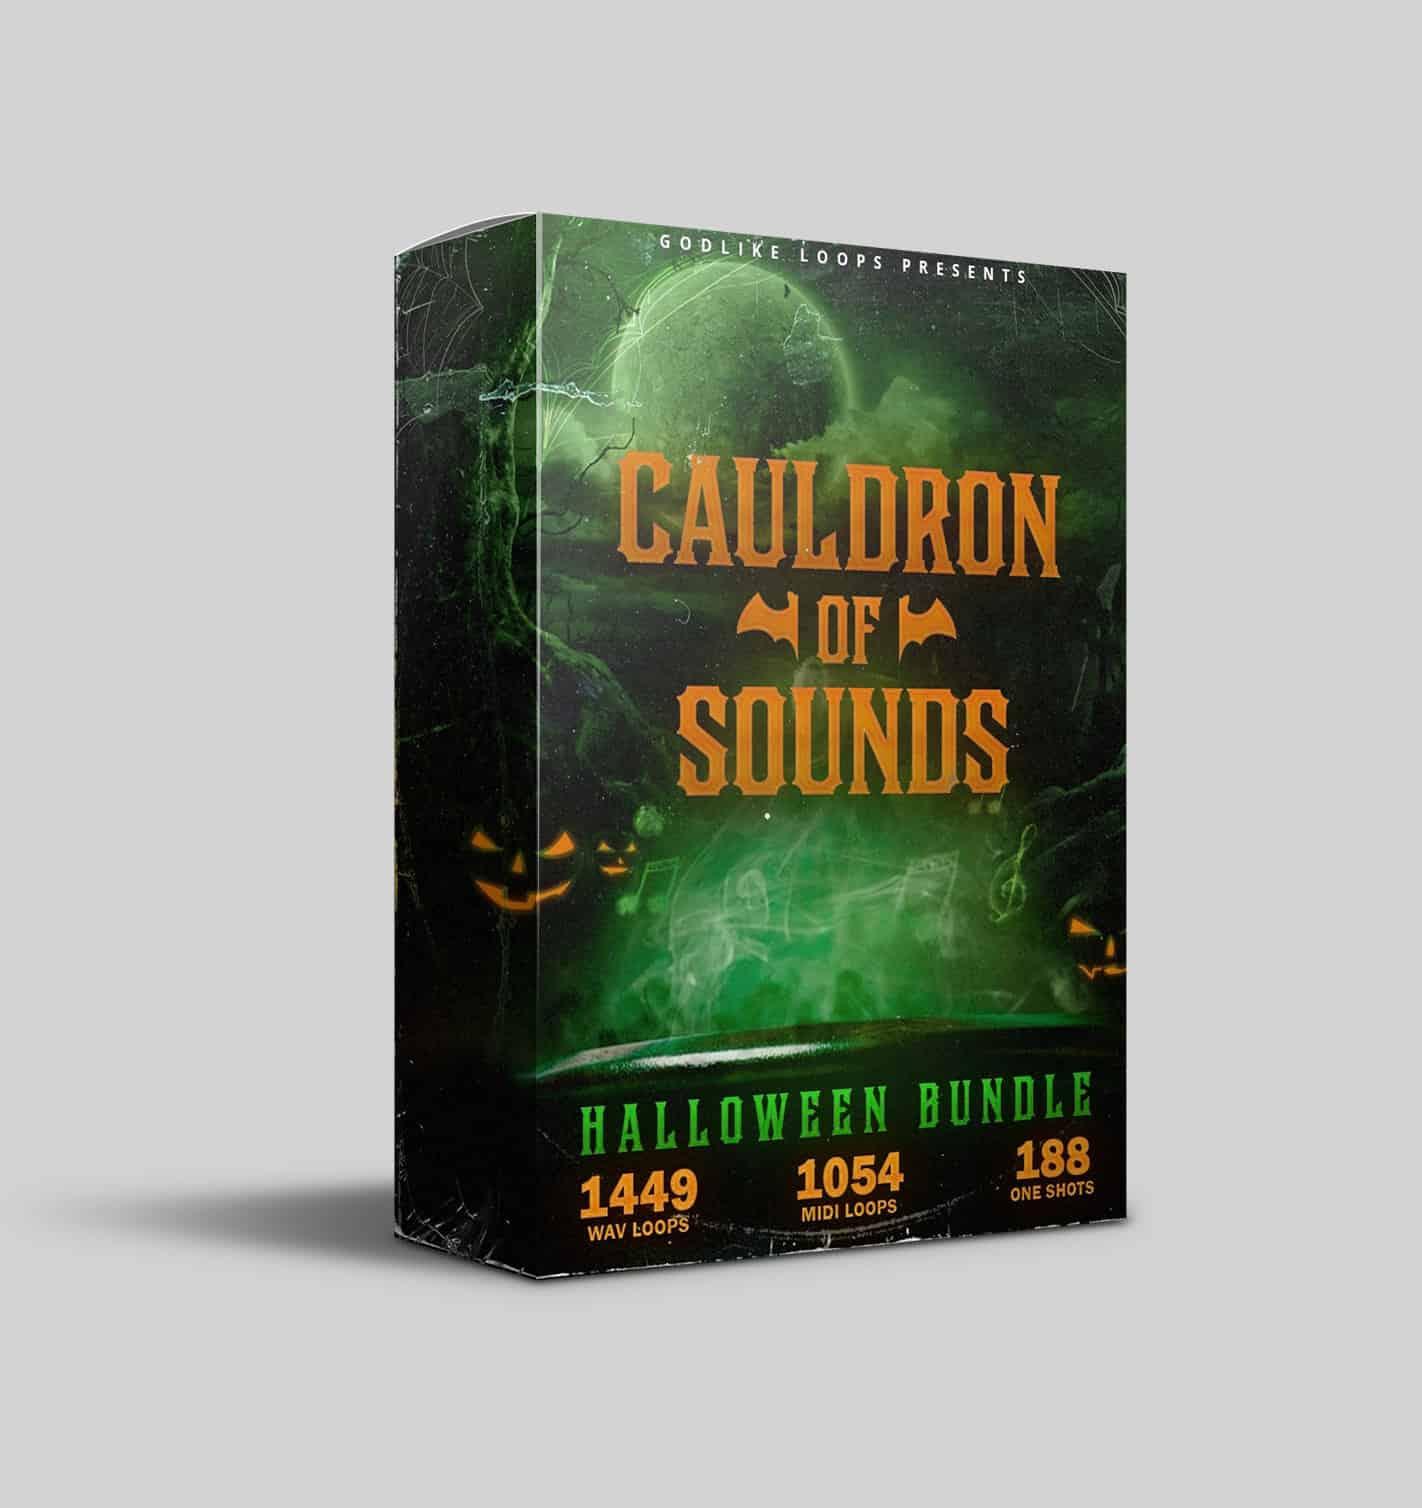 Halloween Bundle - Cauldron Of Sounds